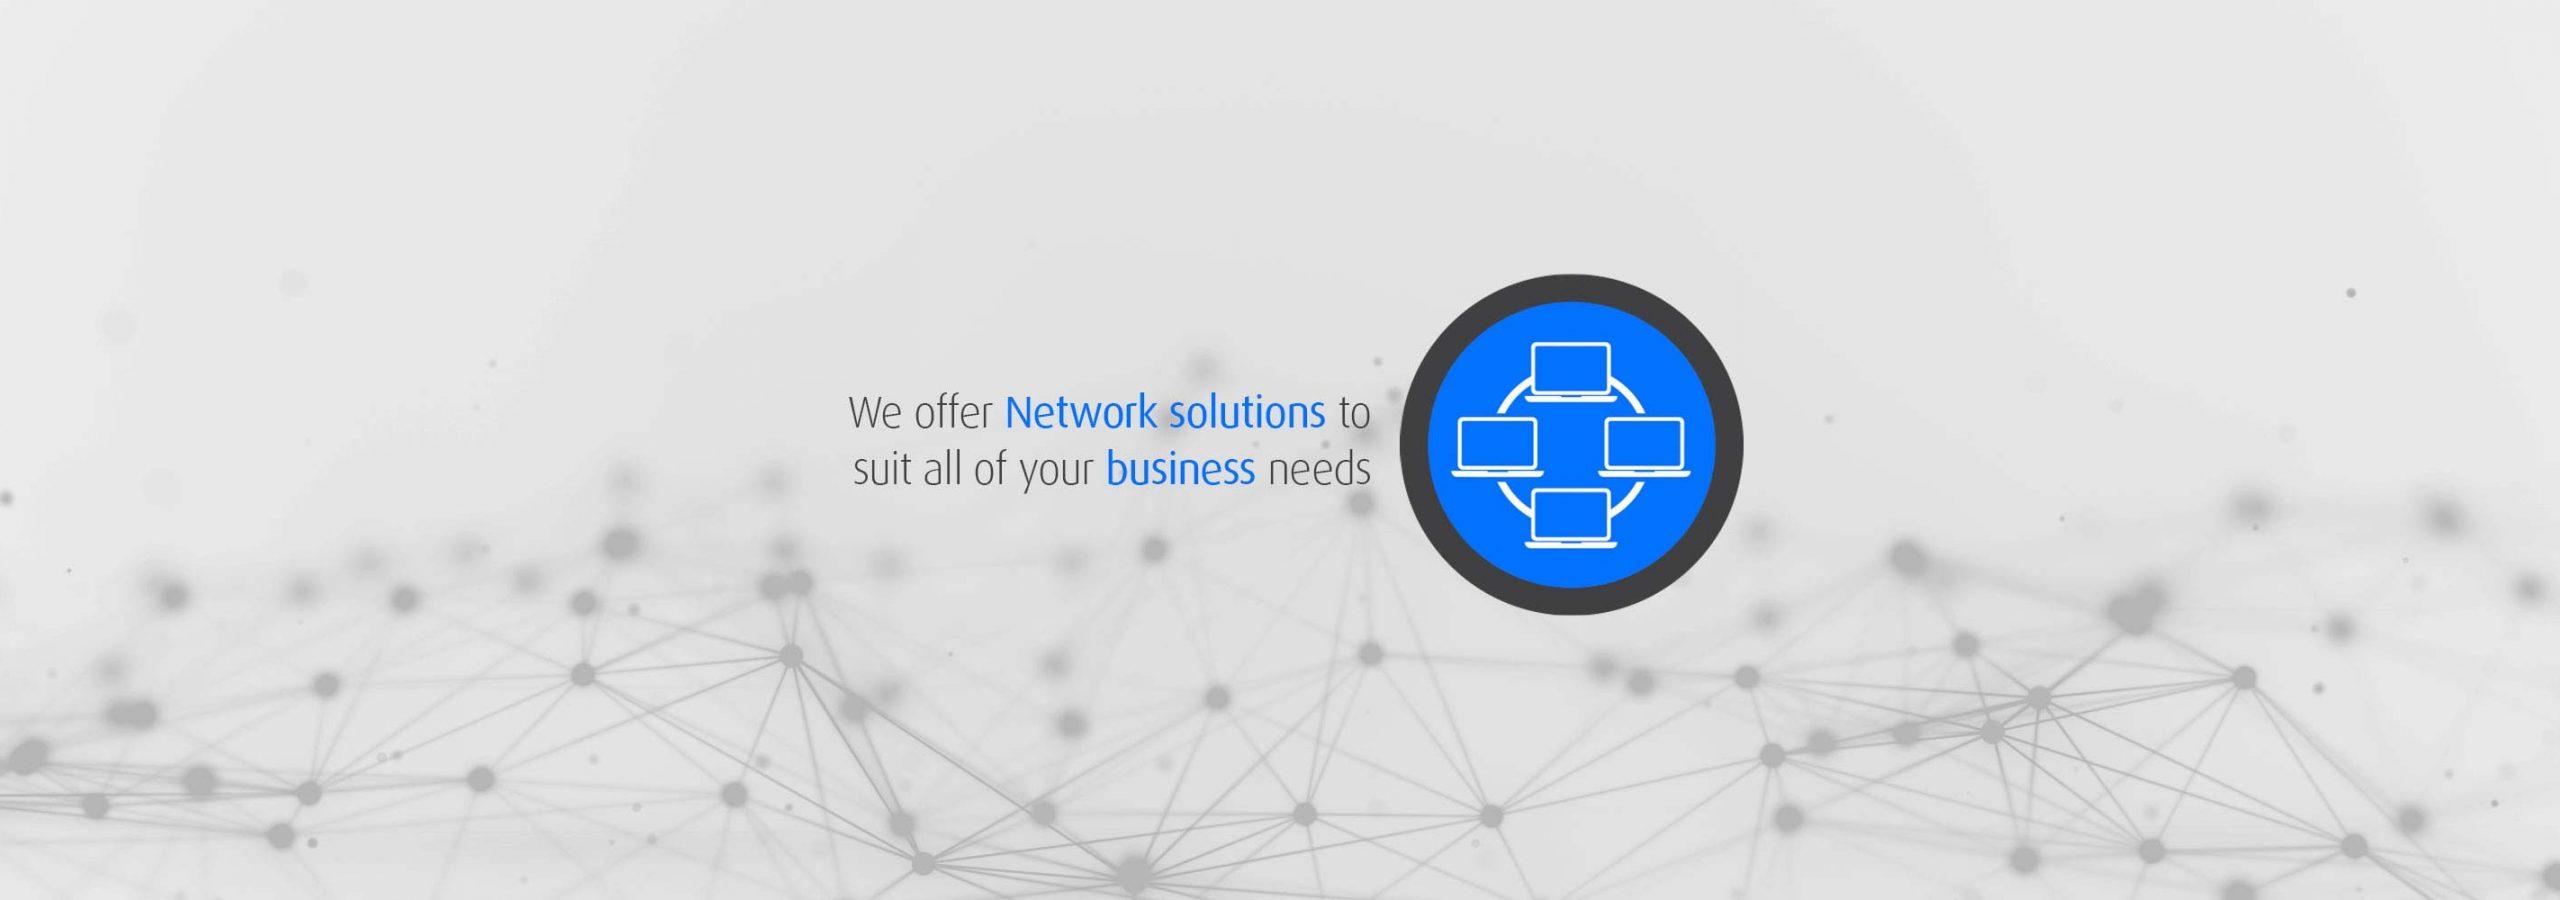 Network Solutions homepage slide